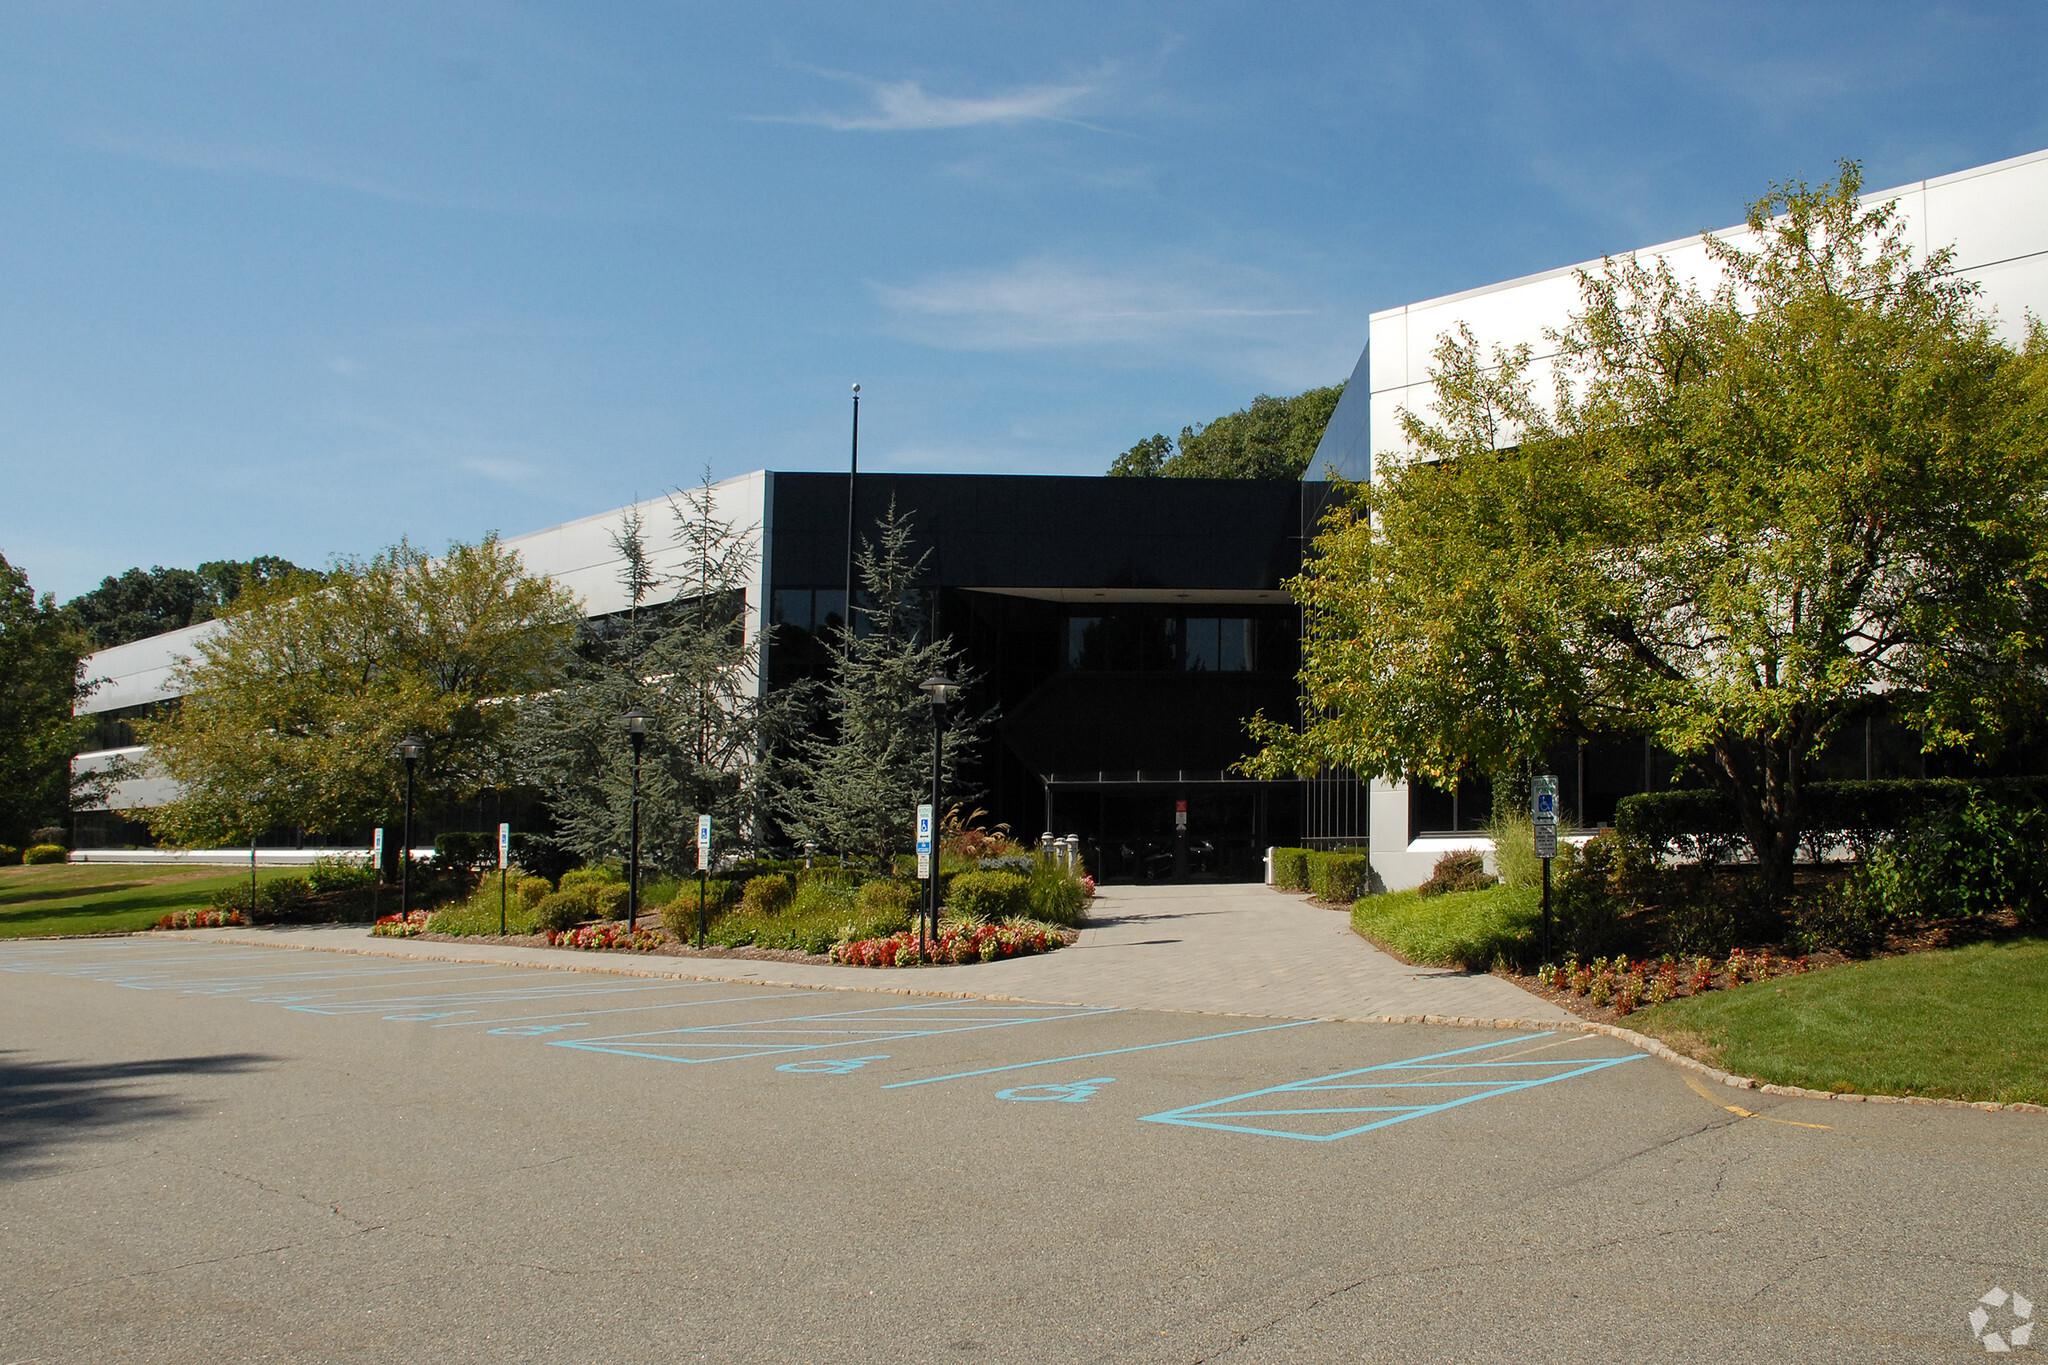 50 Chestnut Ridge Rd., Montvale